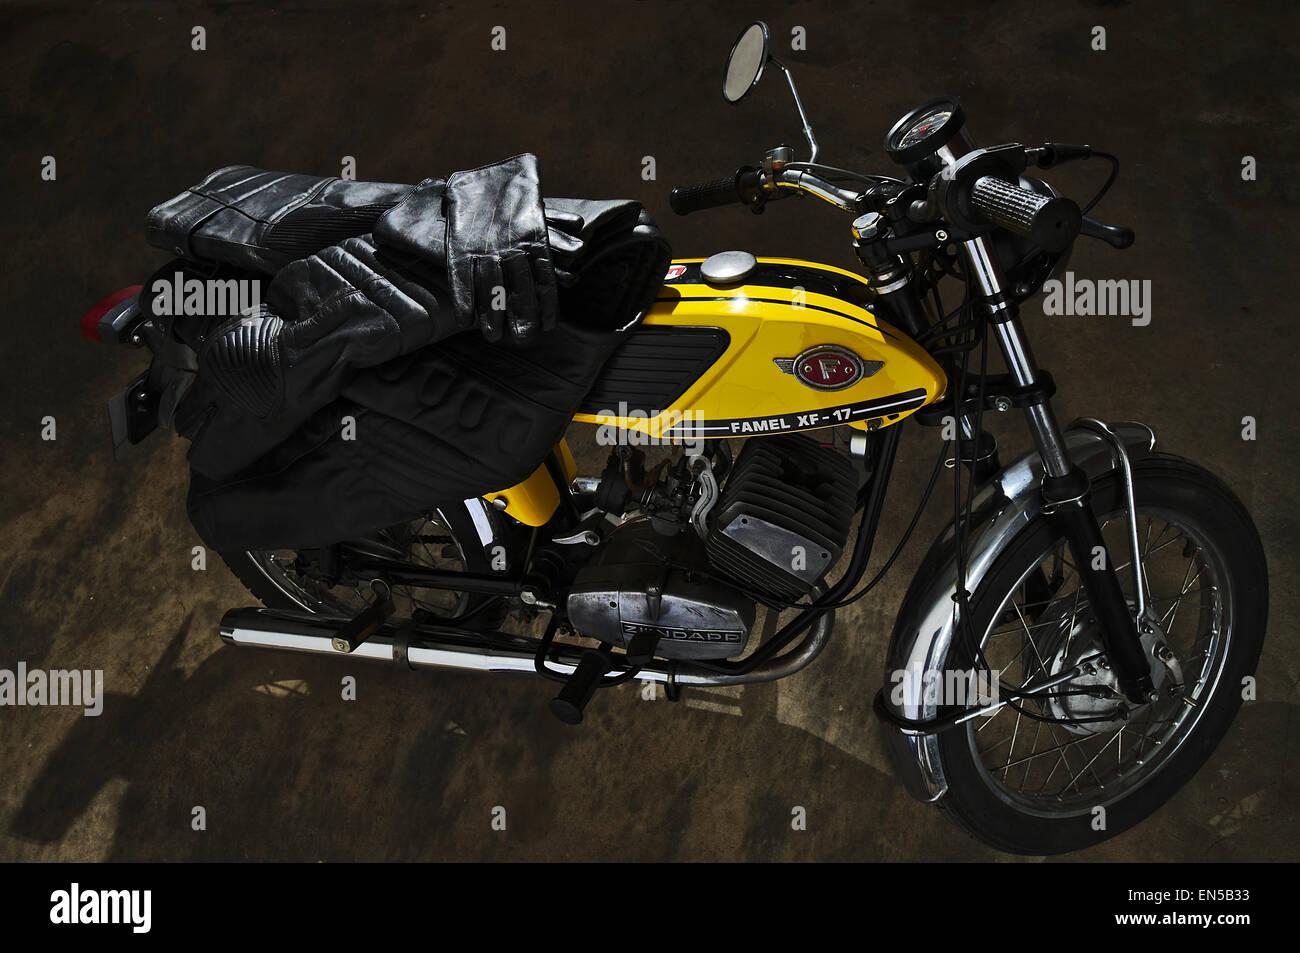 Classic Zundapp bike XF-17 in the garage - Stock Image